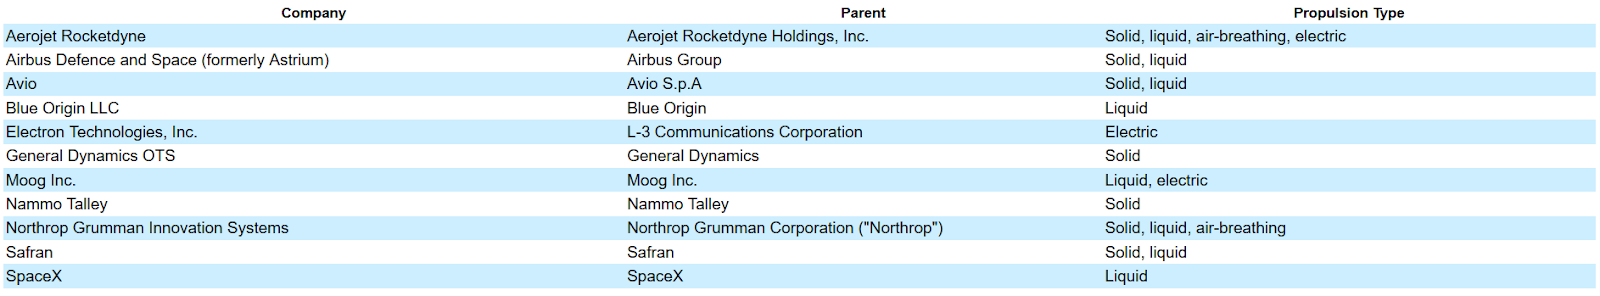 Aerojet Rocketdyne Holdings Inc.: An Aerospace Company With Upward Margins